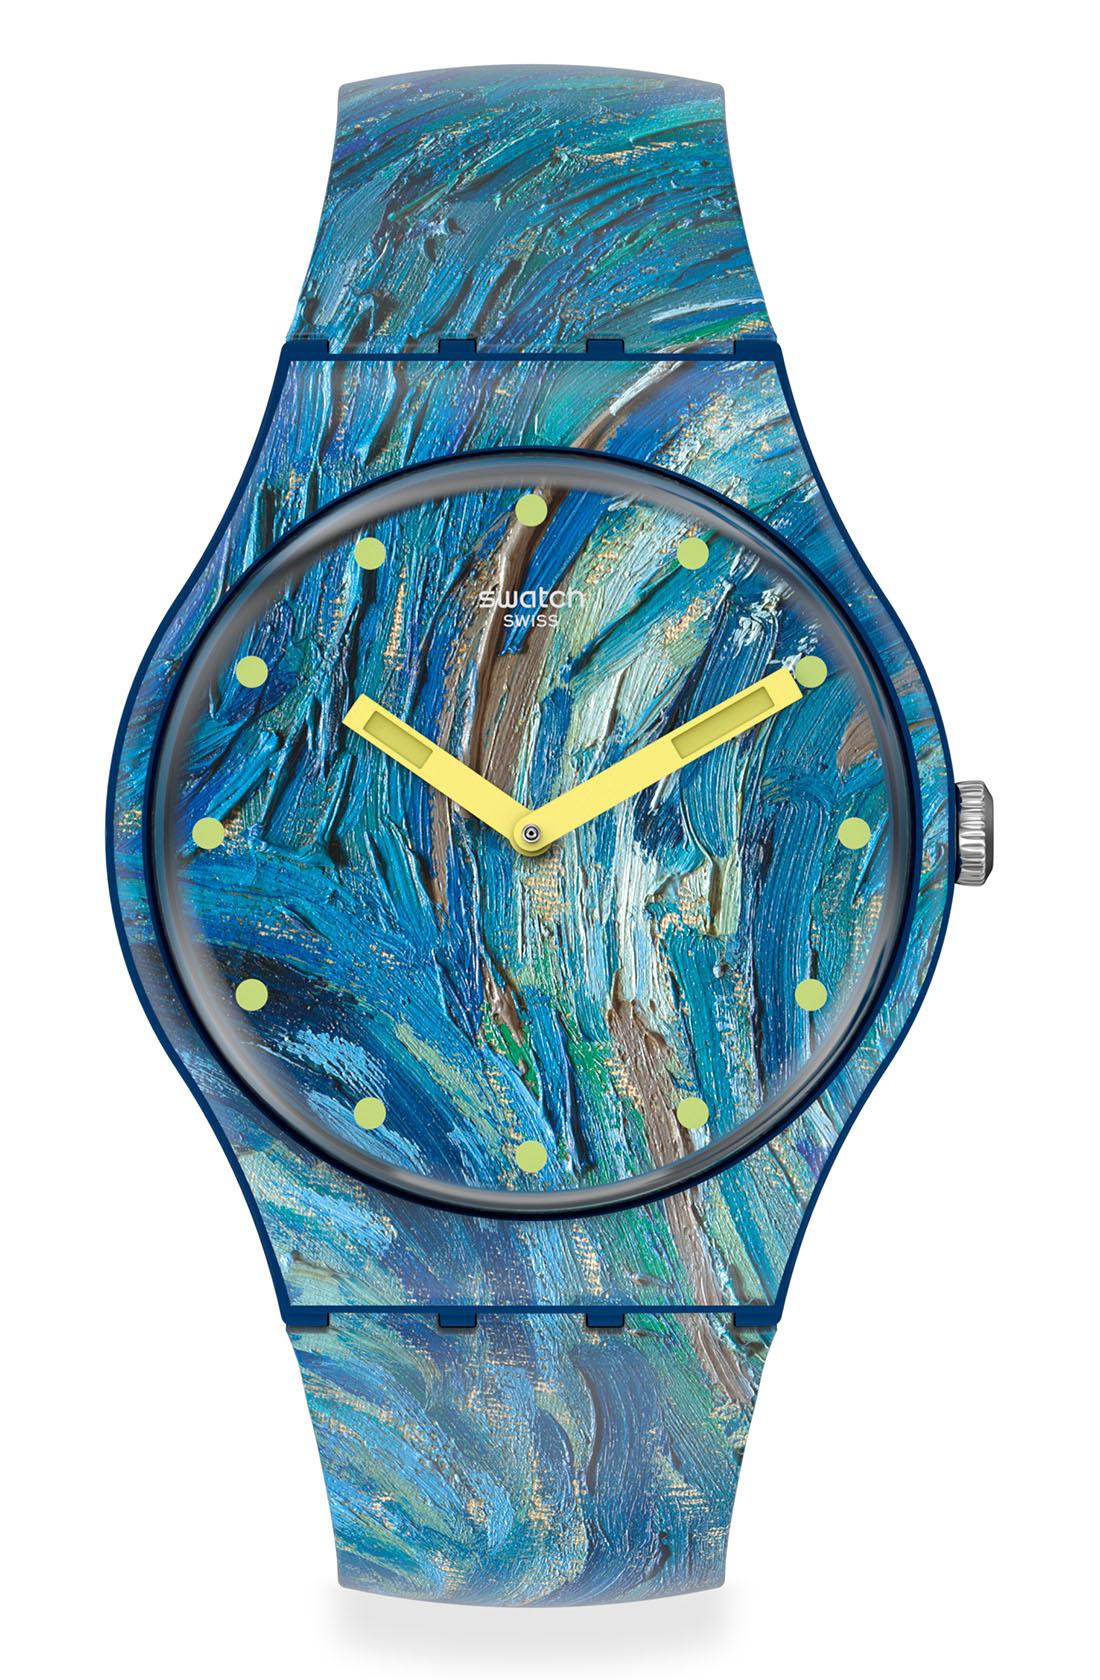 Swatch x MoMA New York - The Starry Night